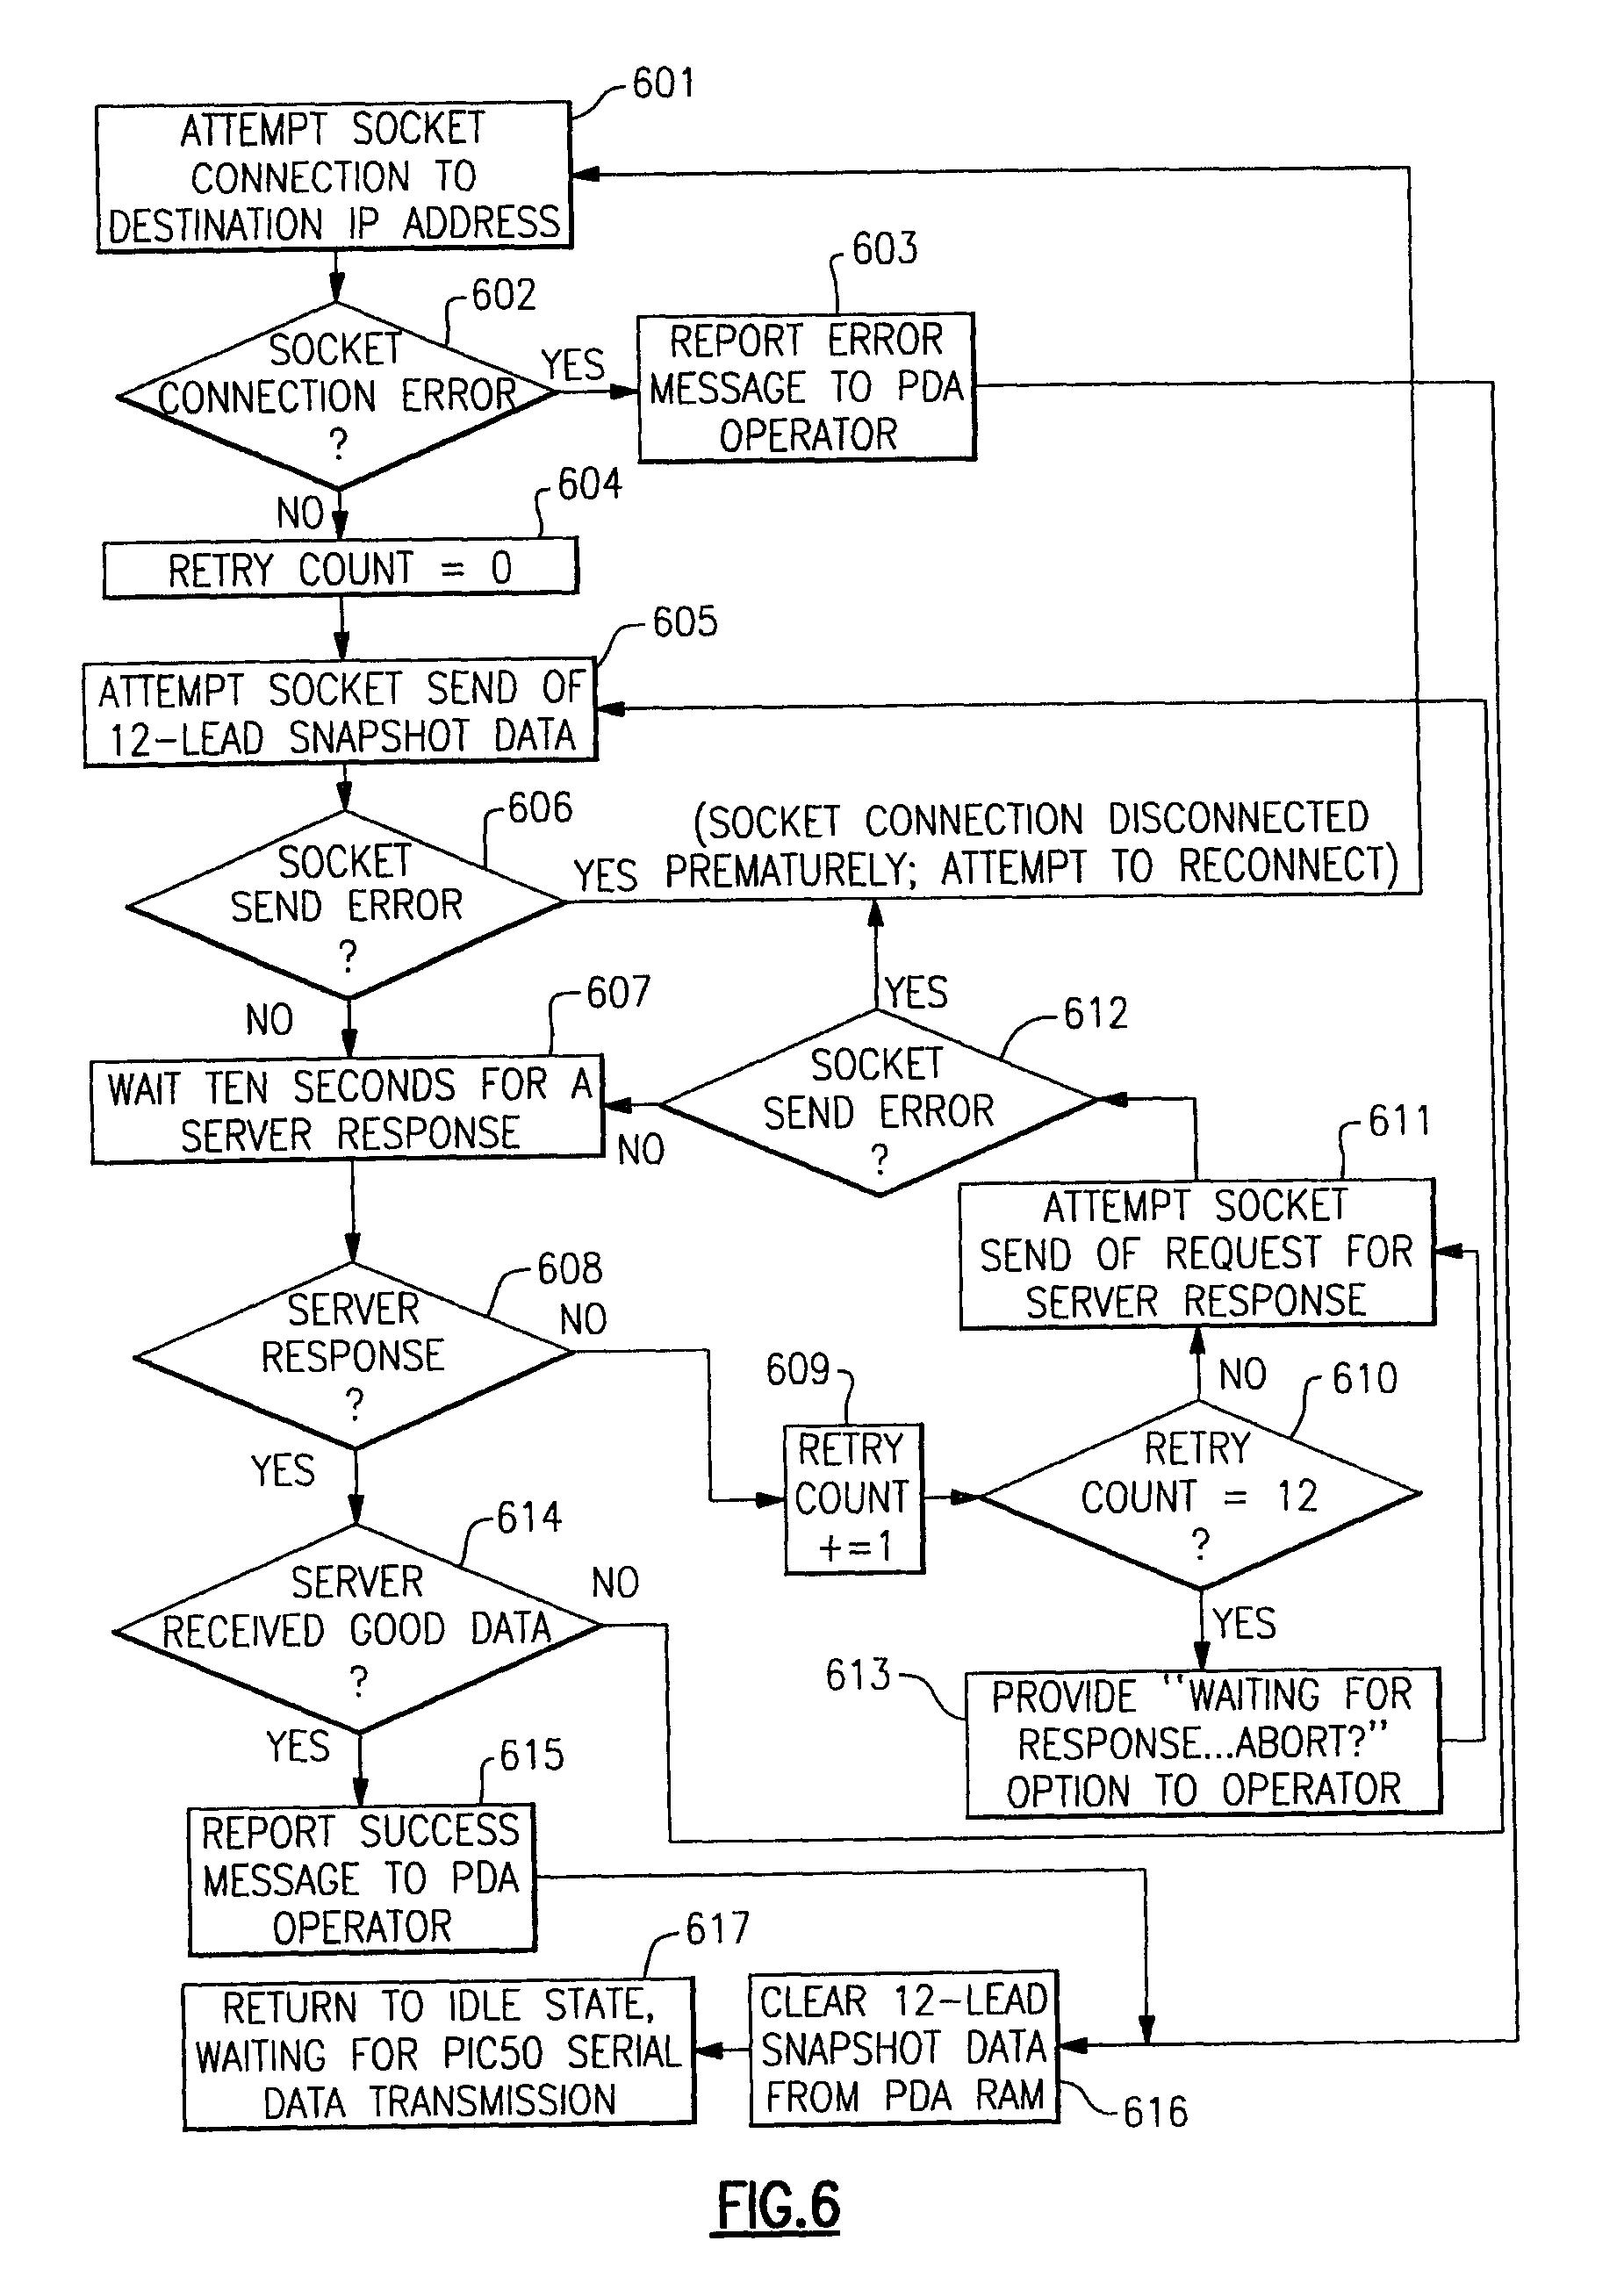 caravan alarm wiring diagram autopage wiring diagram - somurich.com autopage alarm wiring diagram